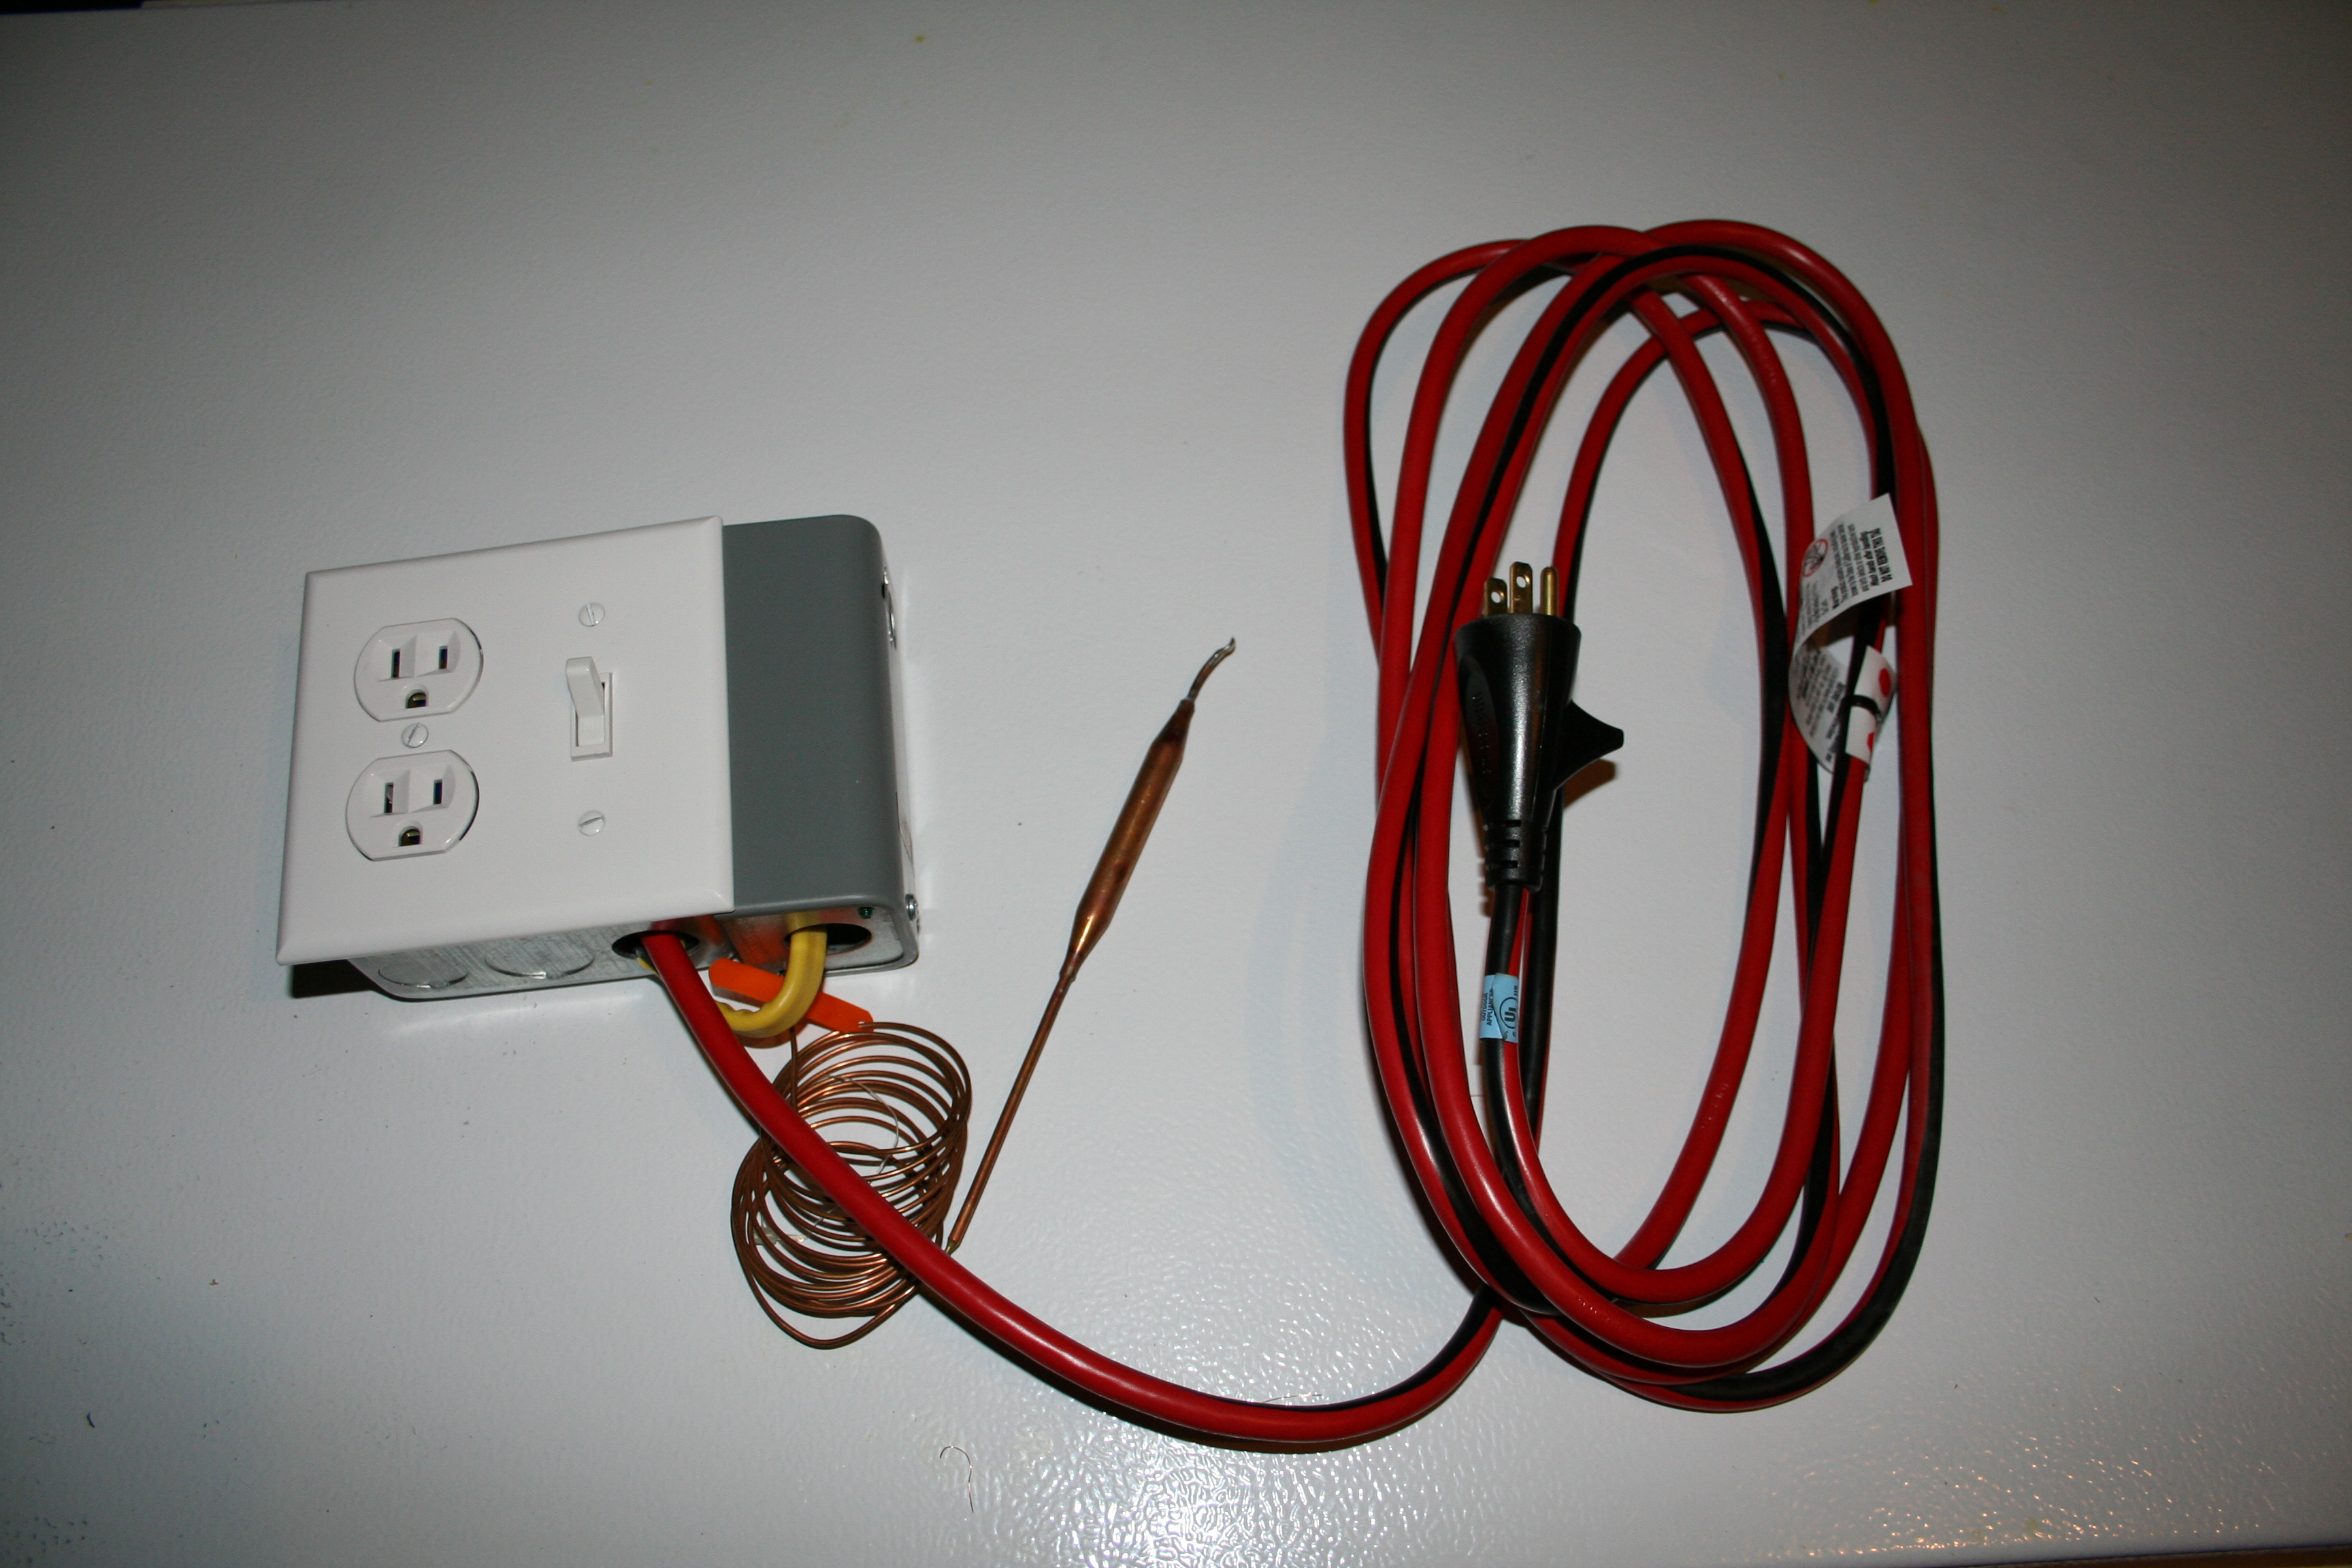 Temperature Control For Freezer or Refrigerator